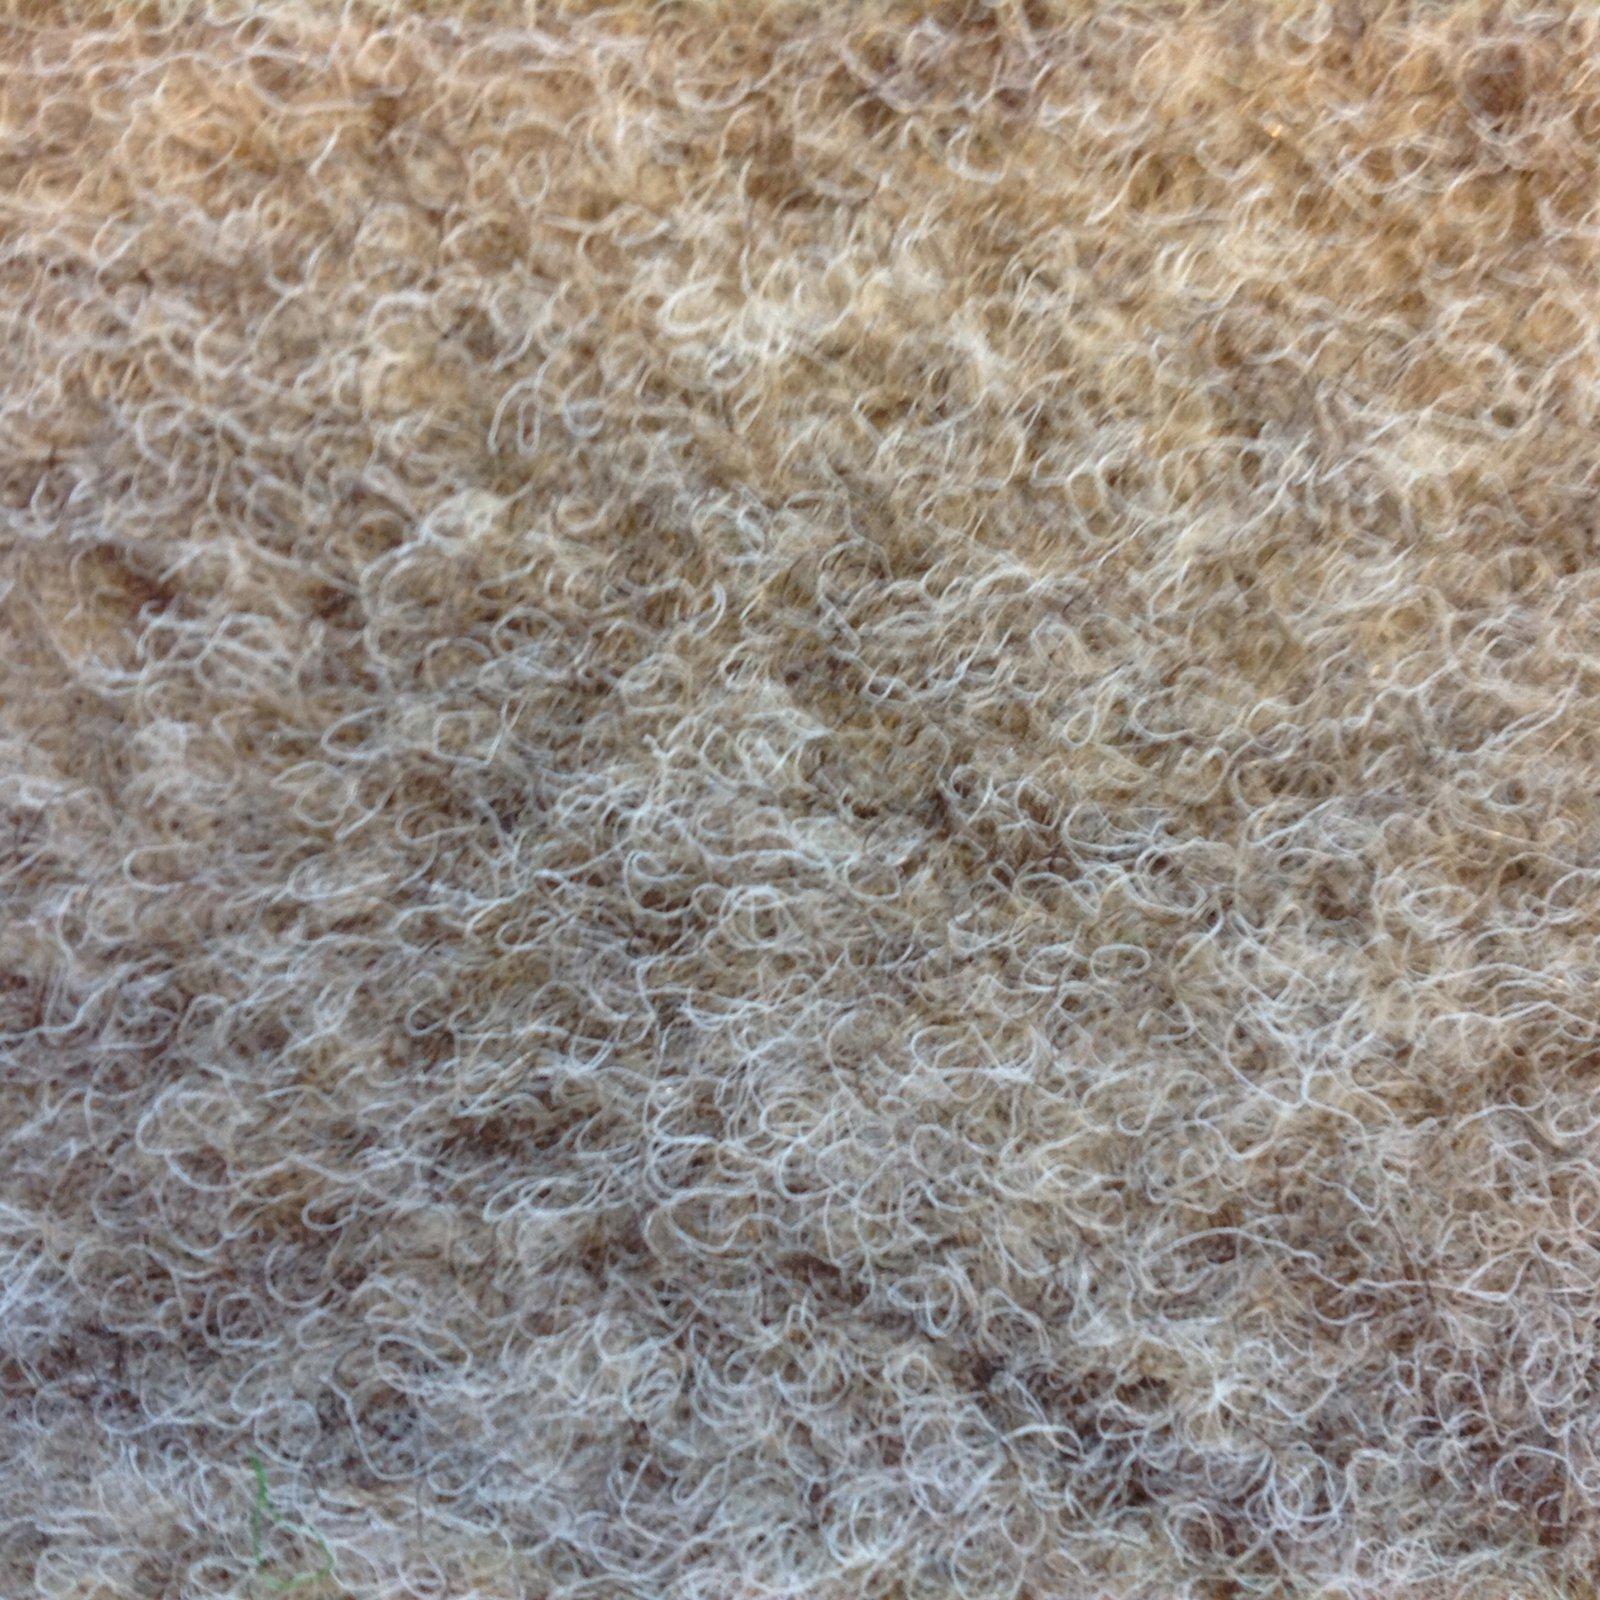 kunstrasen wembley beige 2 meter breit teppichboden bodenbel ge renovieren roller. Black Bedroom Furniture Sets. Home Design Ideas